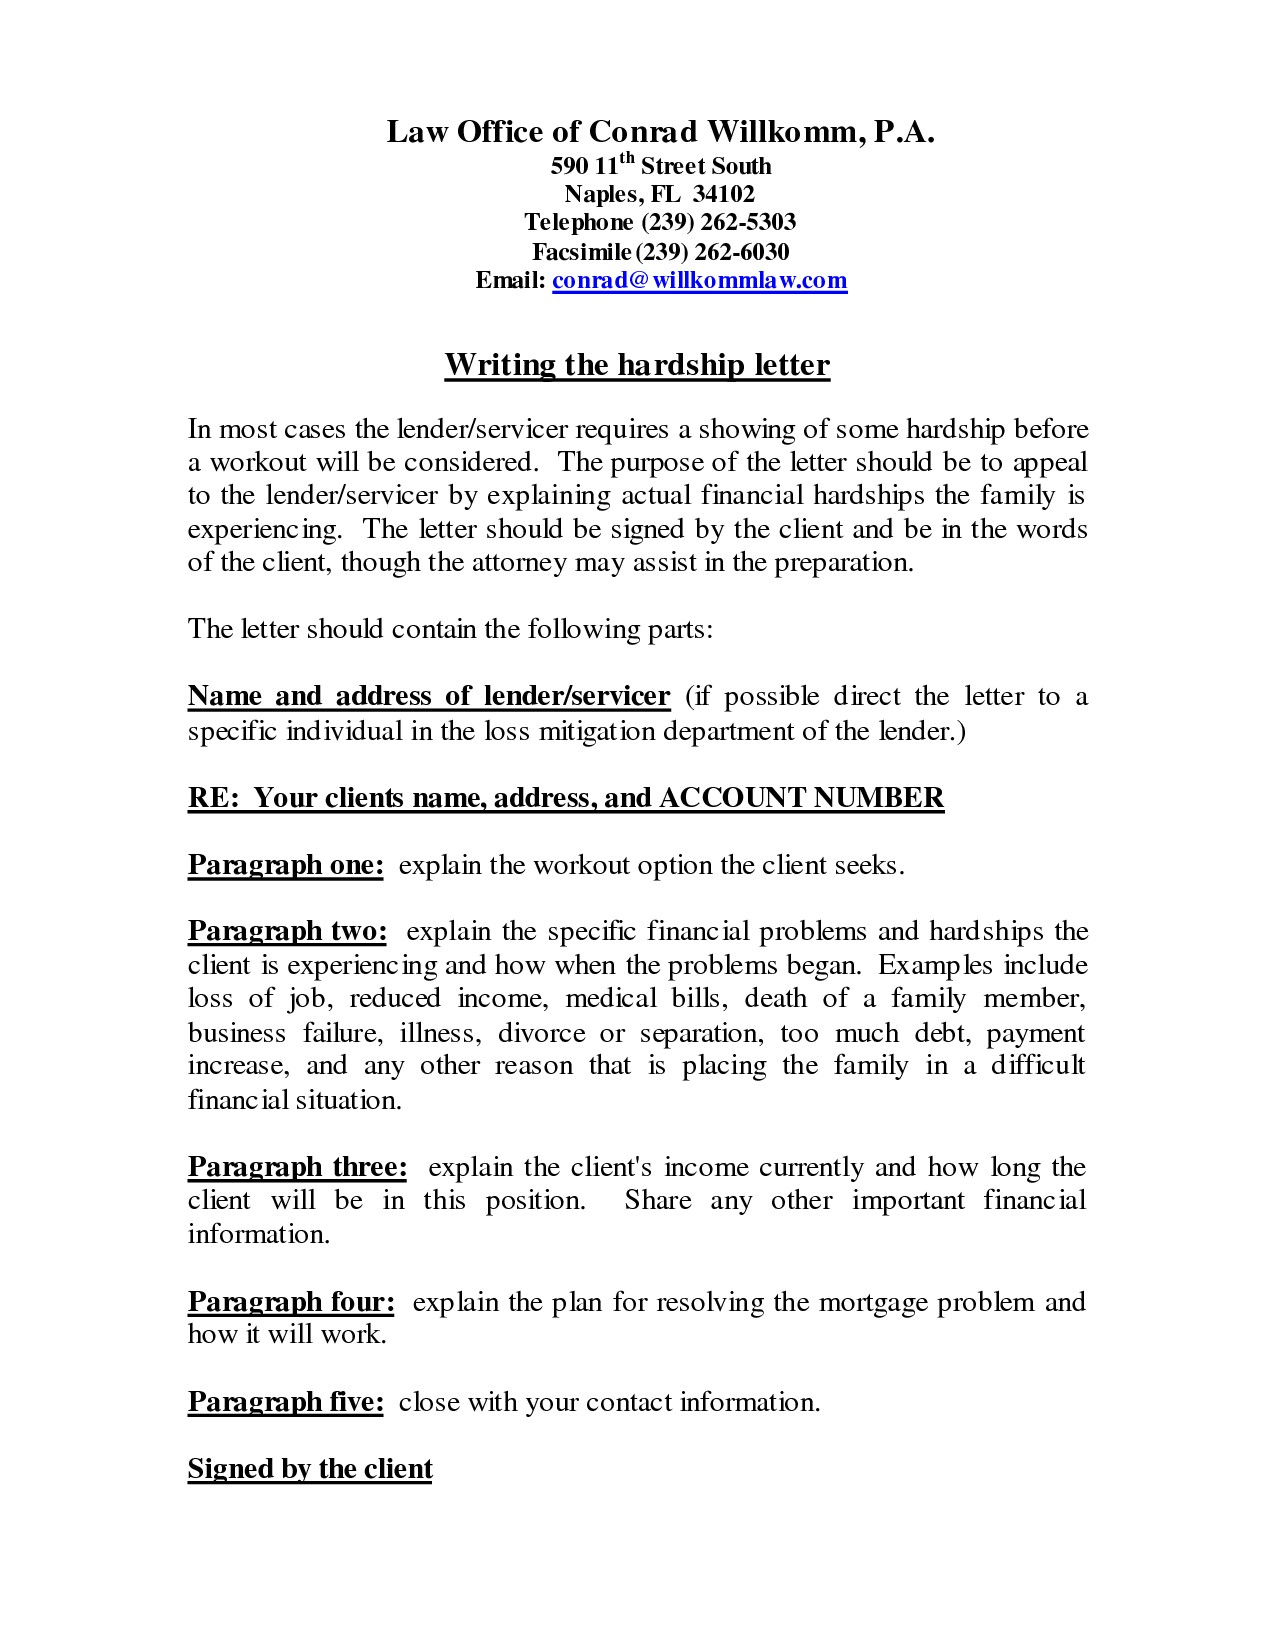 401k Hardship Letter Template - Famous Financial Hardship Letter Gift Administrative Ficer Cover